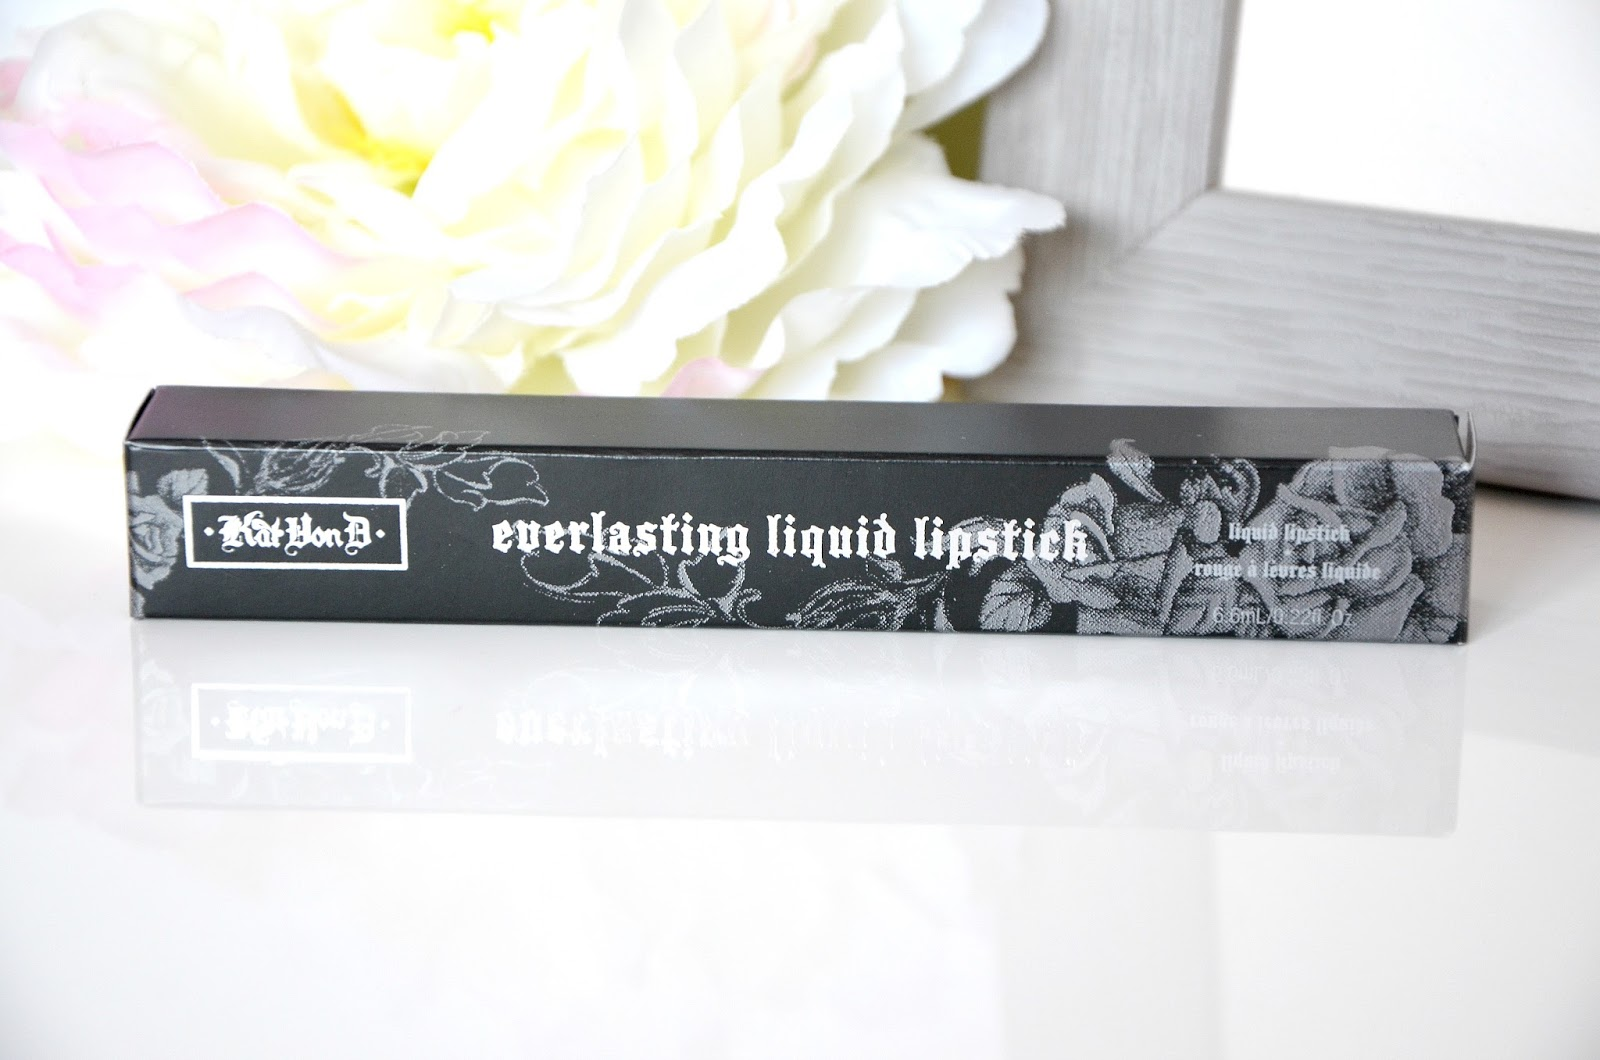 Everlasting Liquid Lipstick Kat Von D